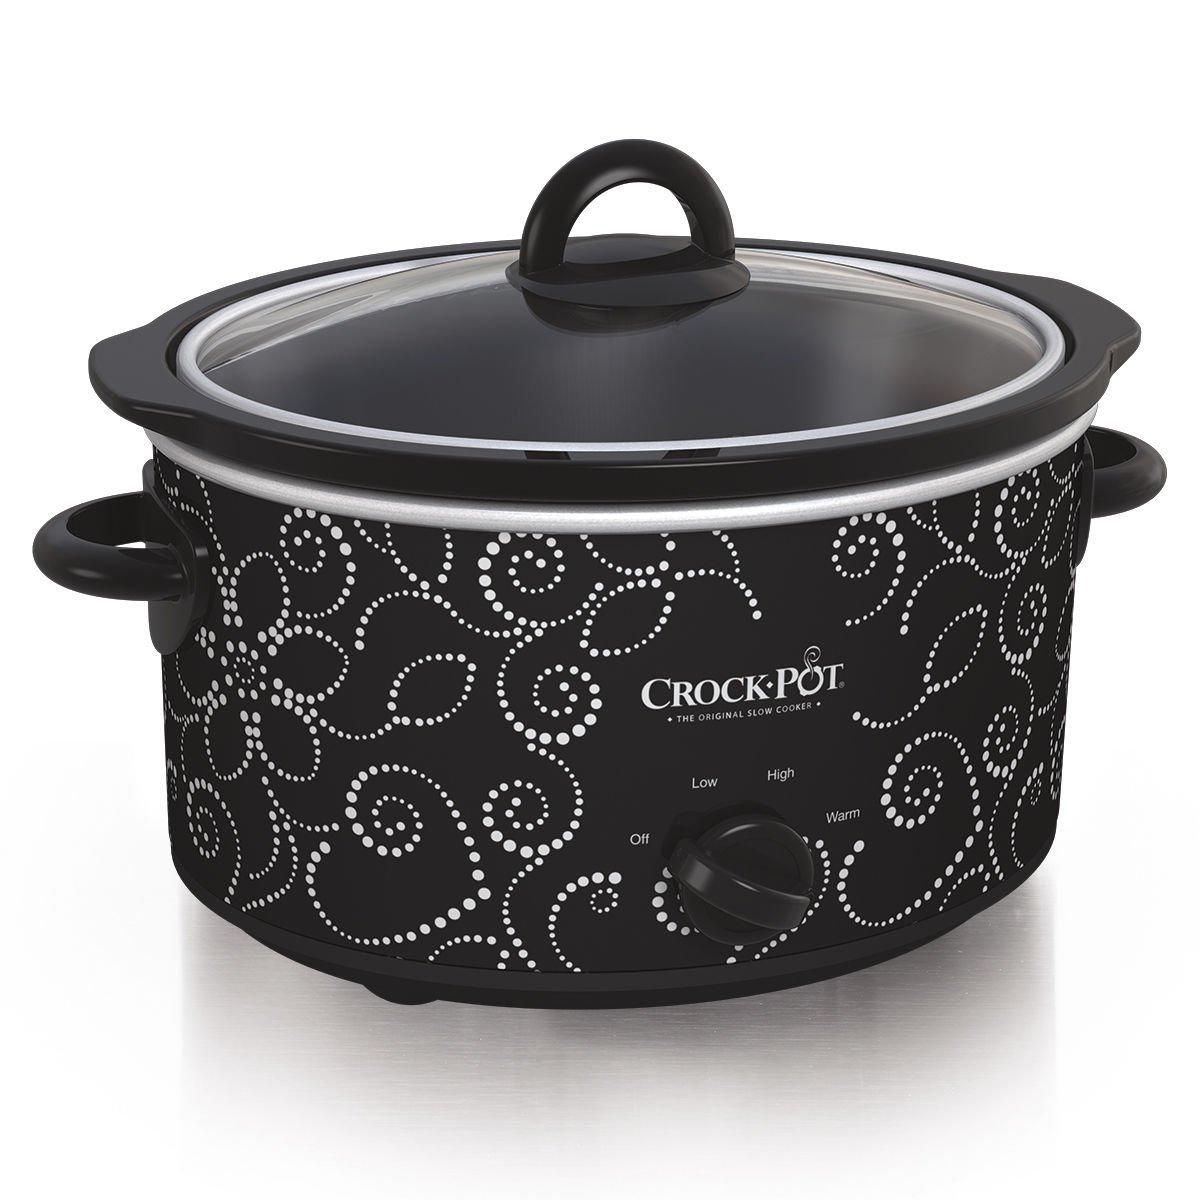 Crockpot Manual Slow Cooker, 4 quart, Black White